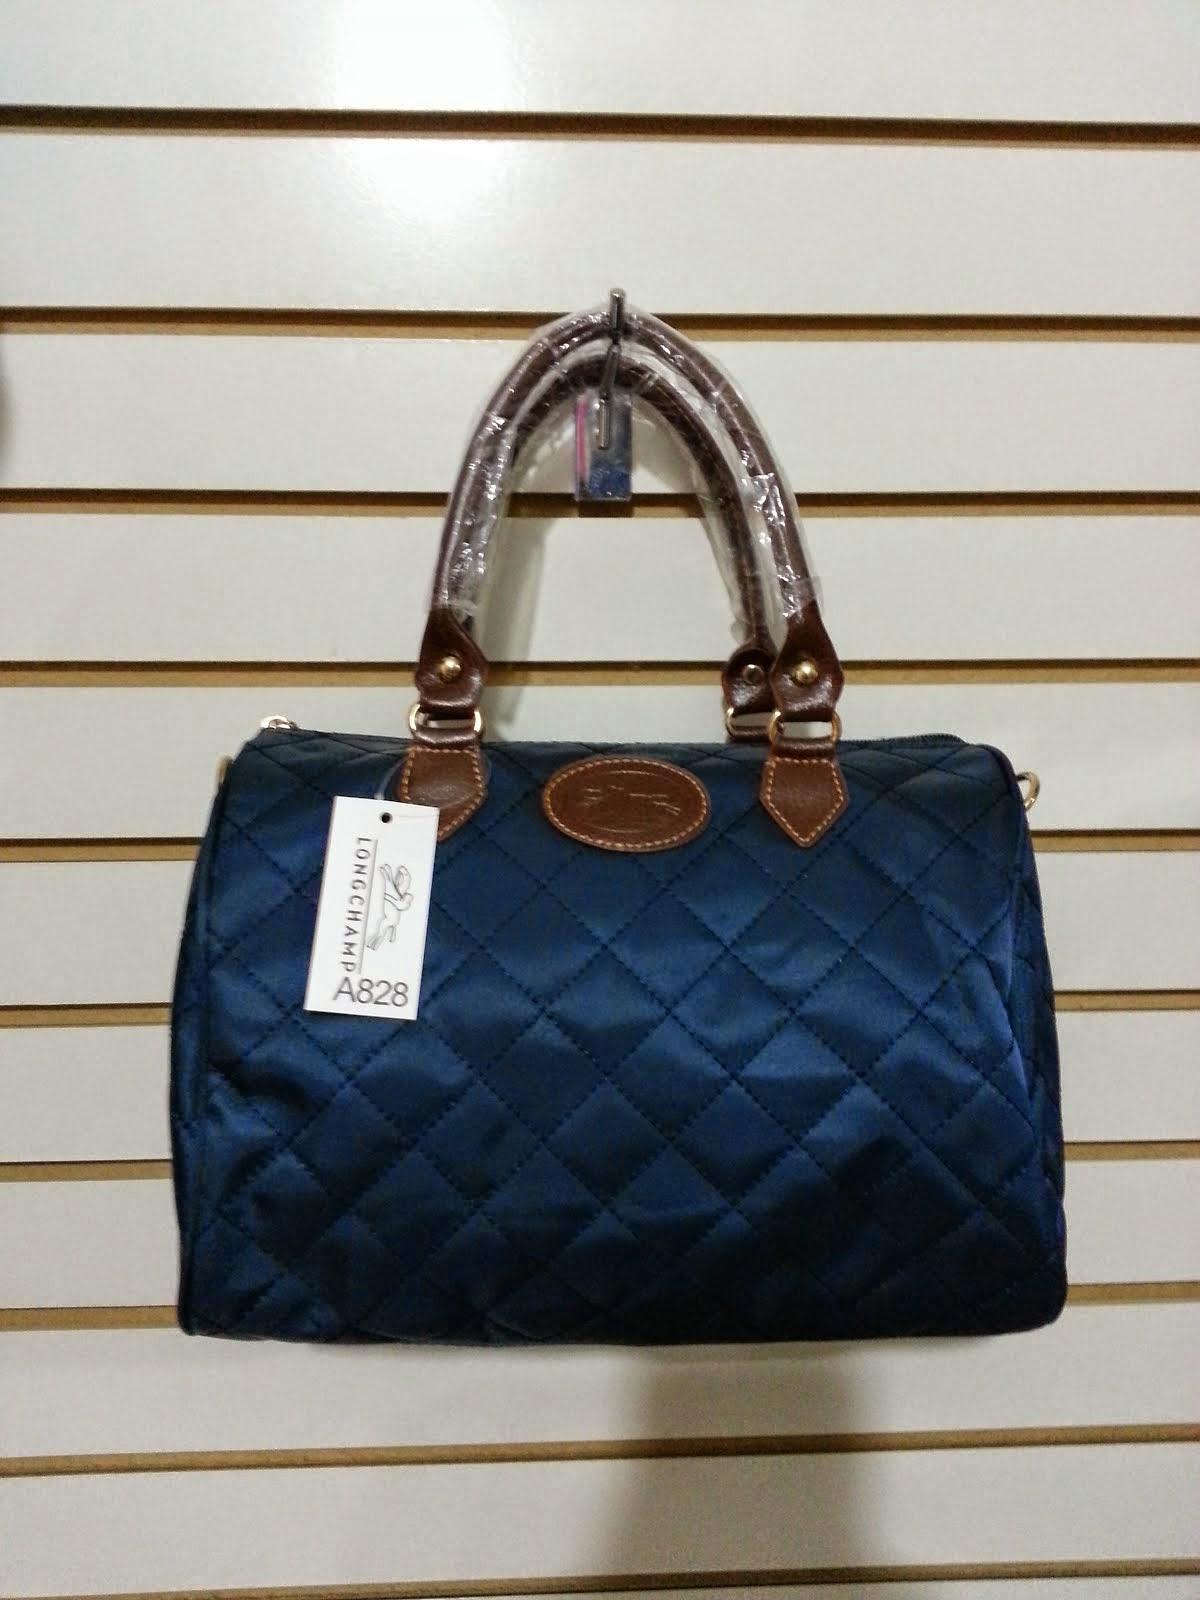 CARTERA LONCHANG BAUL a828 azul